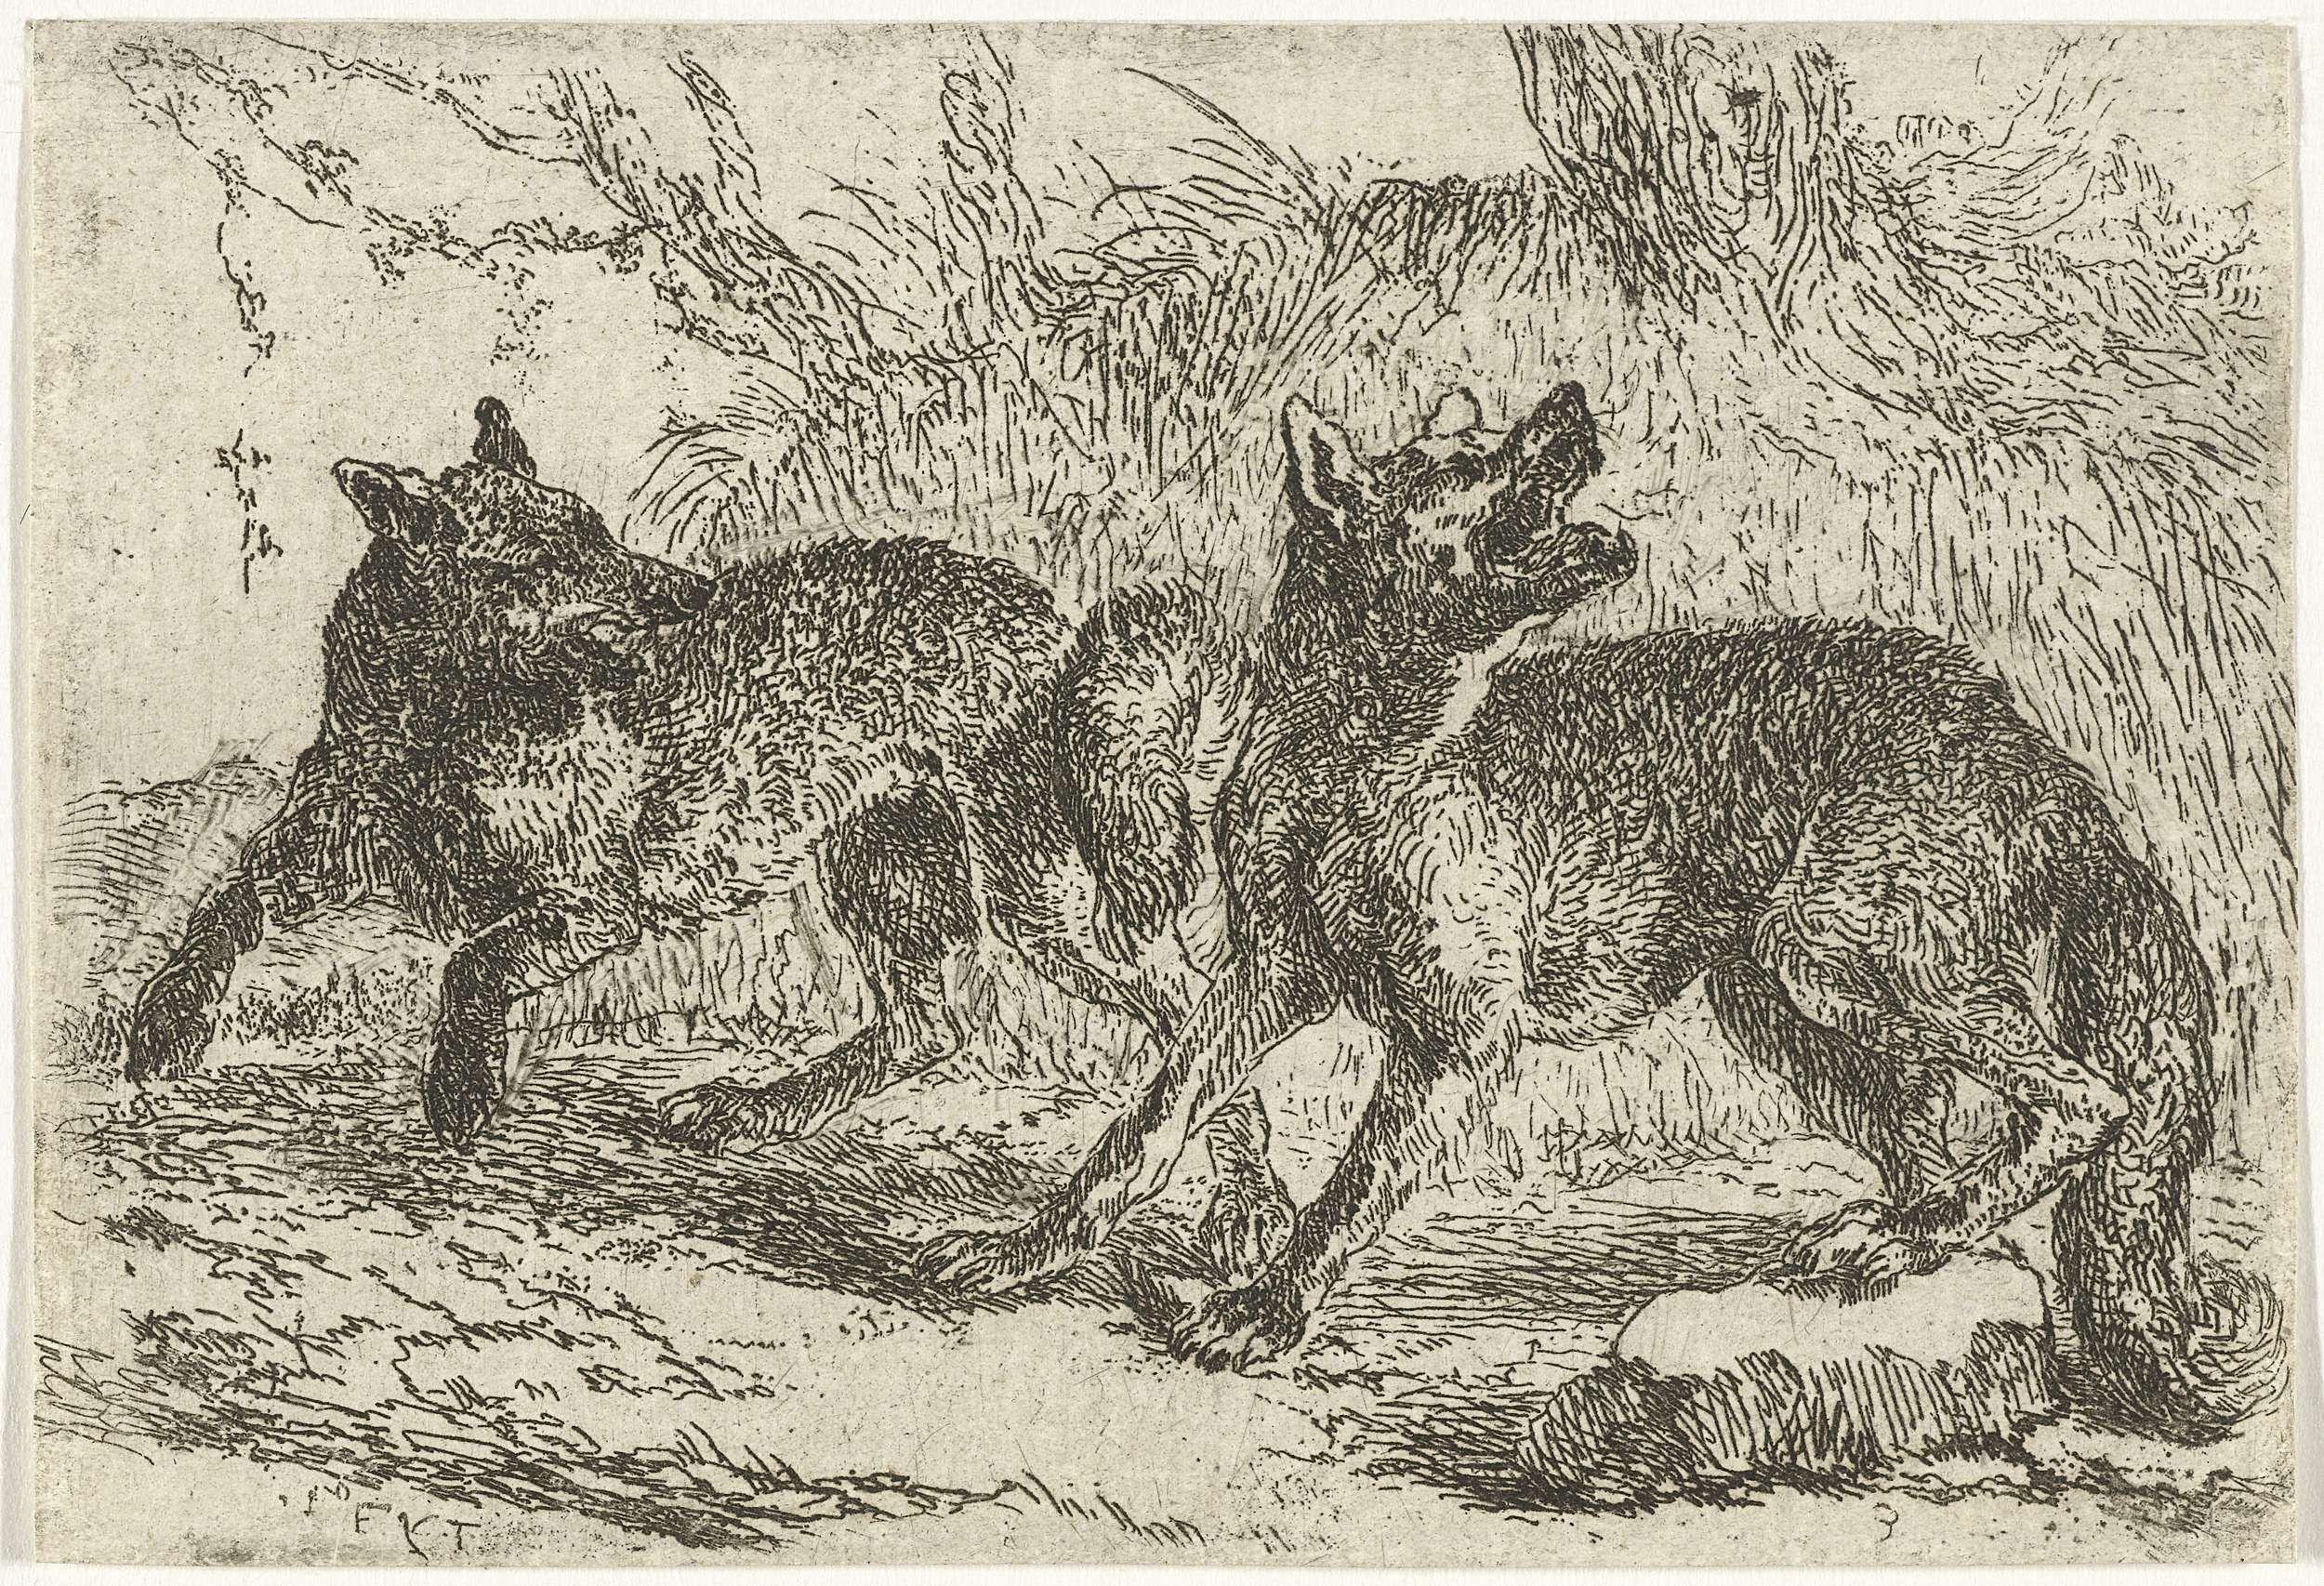 Jan Fijt | Twee wolven, Jan Fijt, c. 1621 - 1661 |